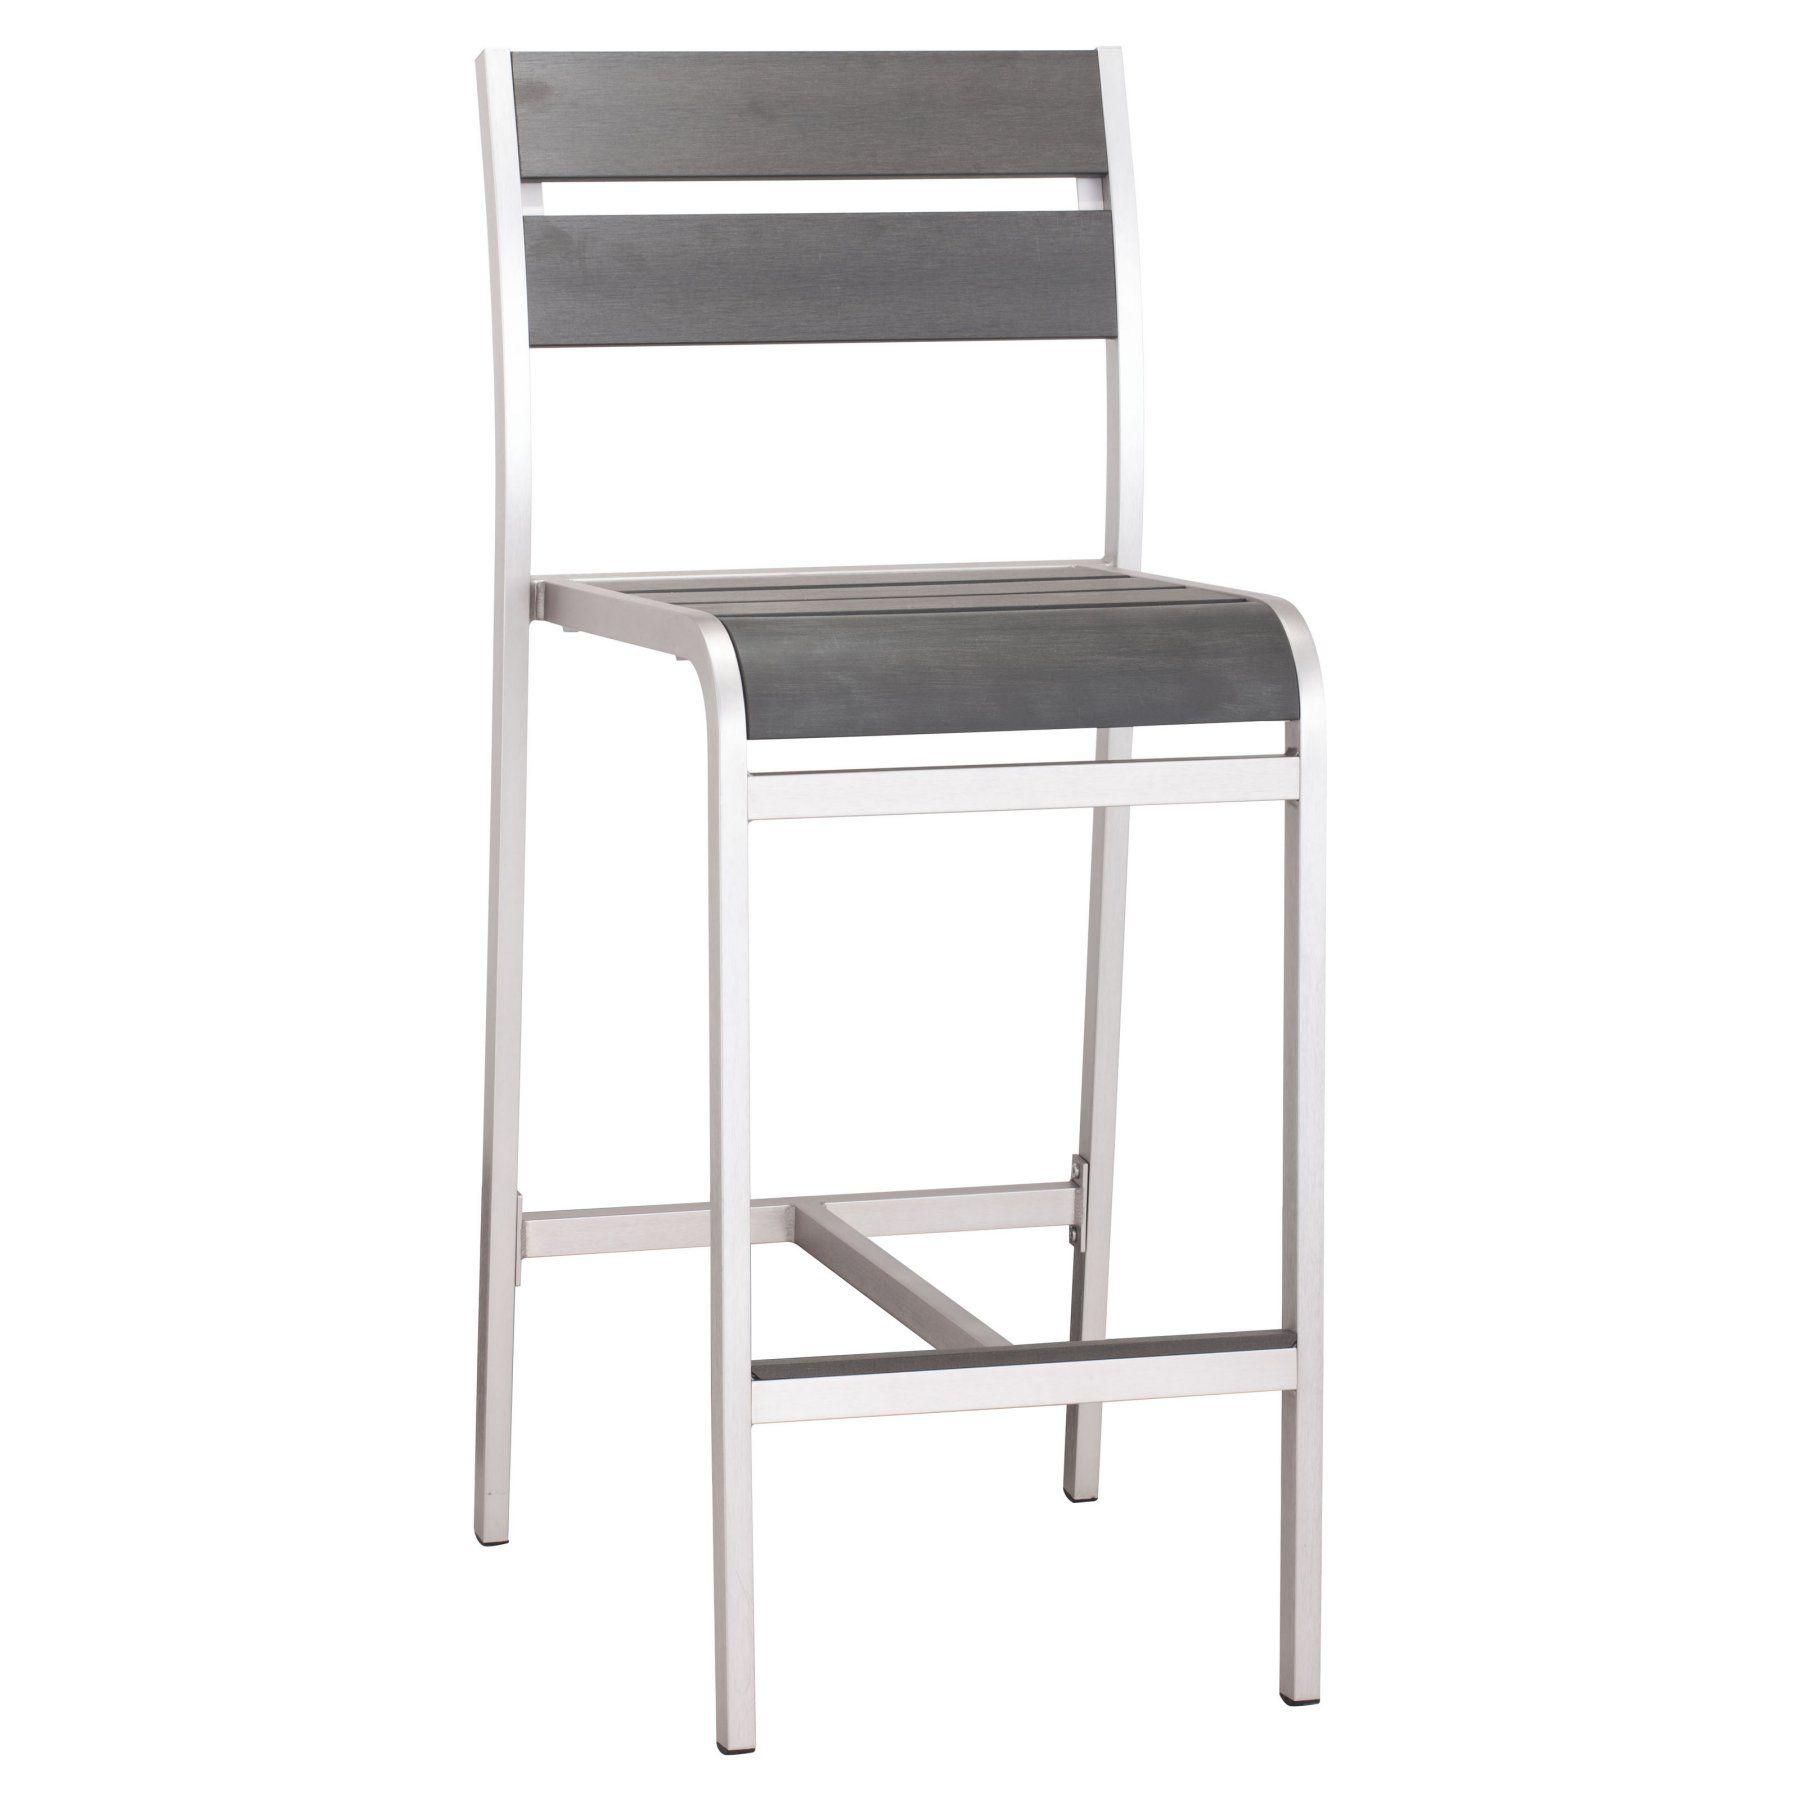 Zuo Vive Megapolis Aluminum Bar Armless Chair - 703186